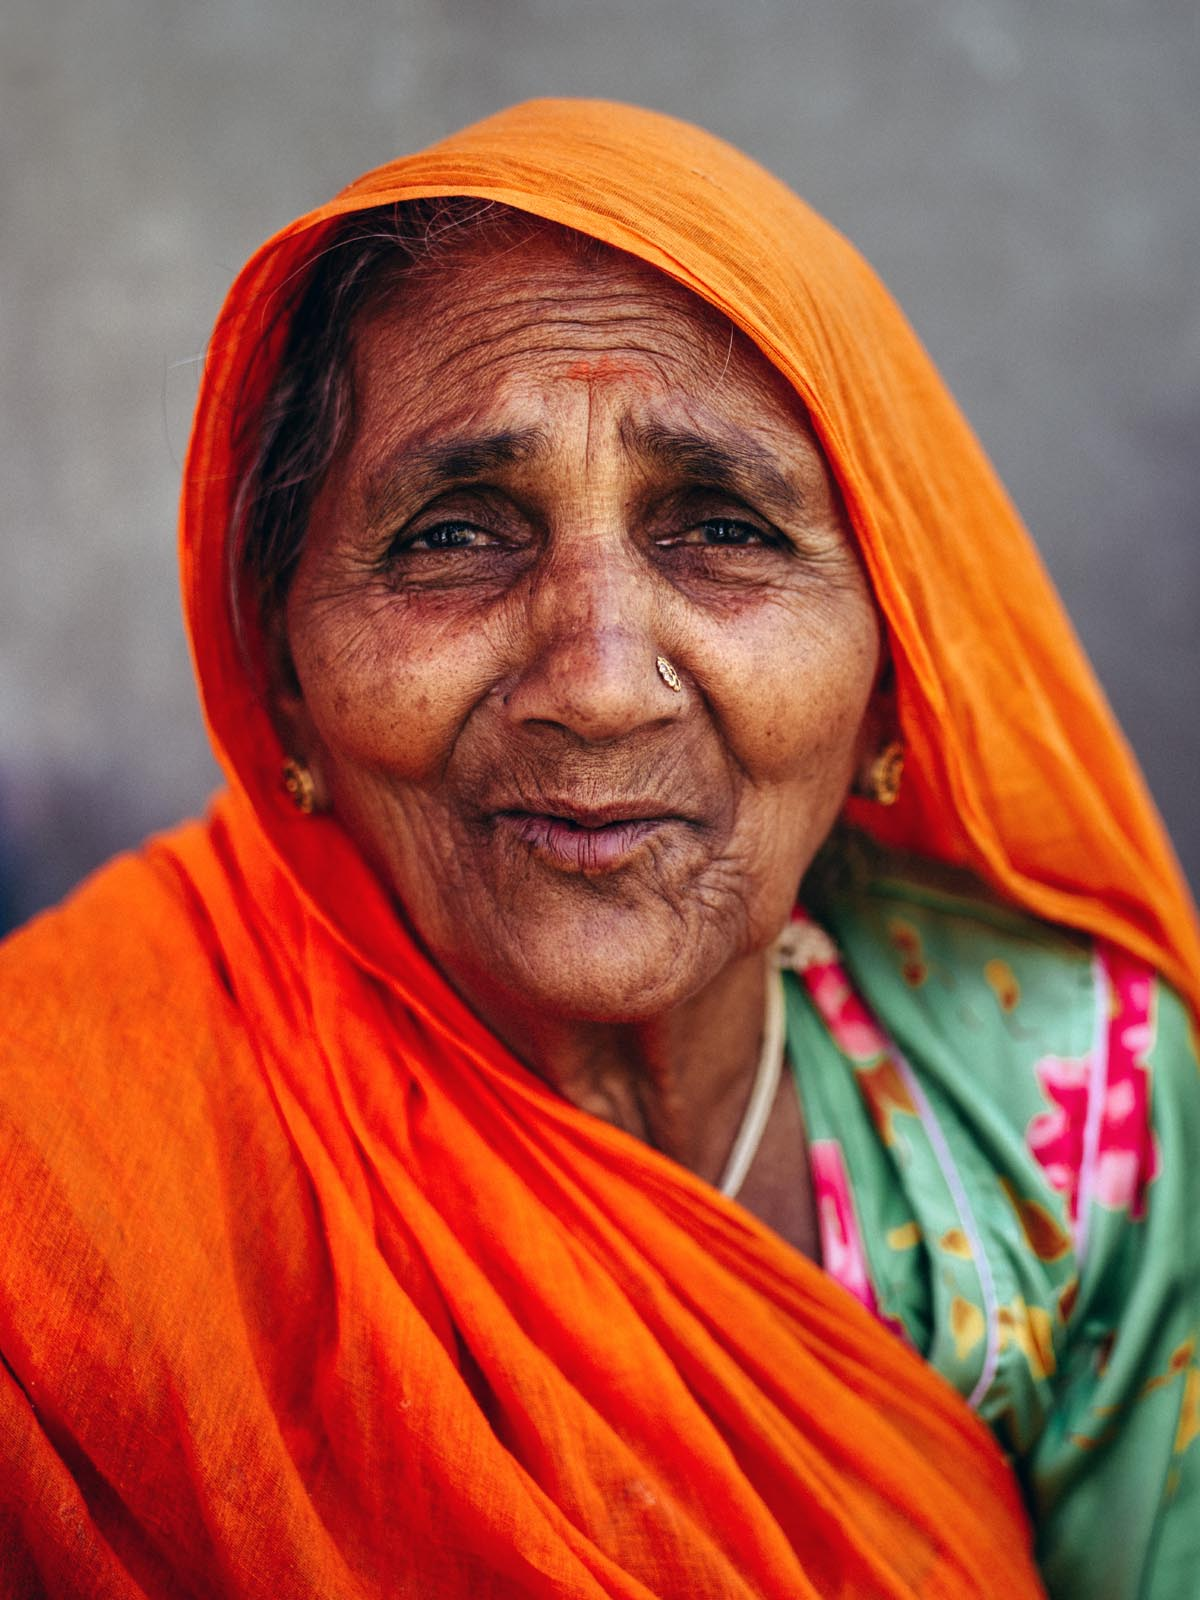 india-travel-photography-portrait-01.jpg